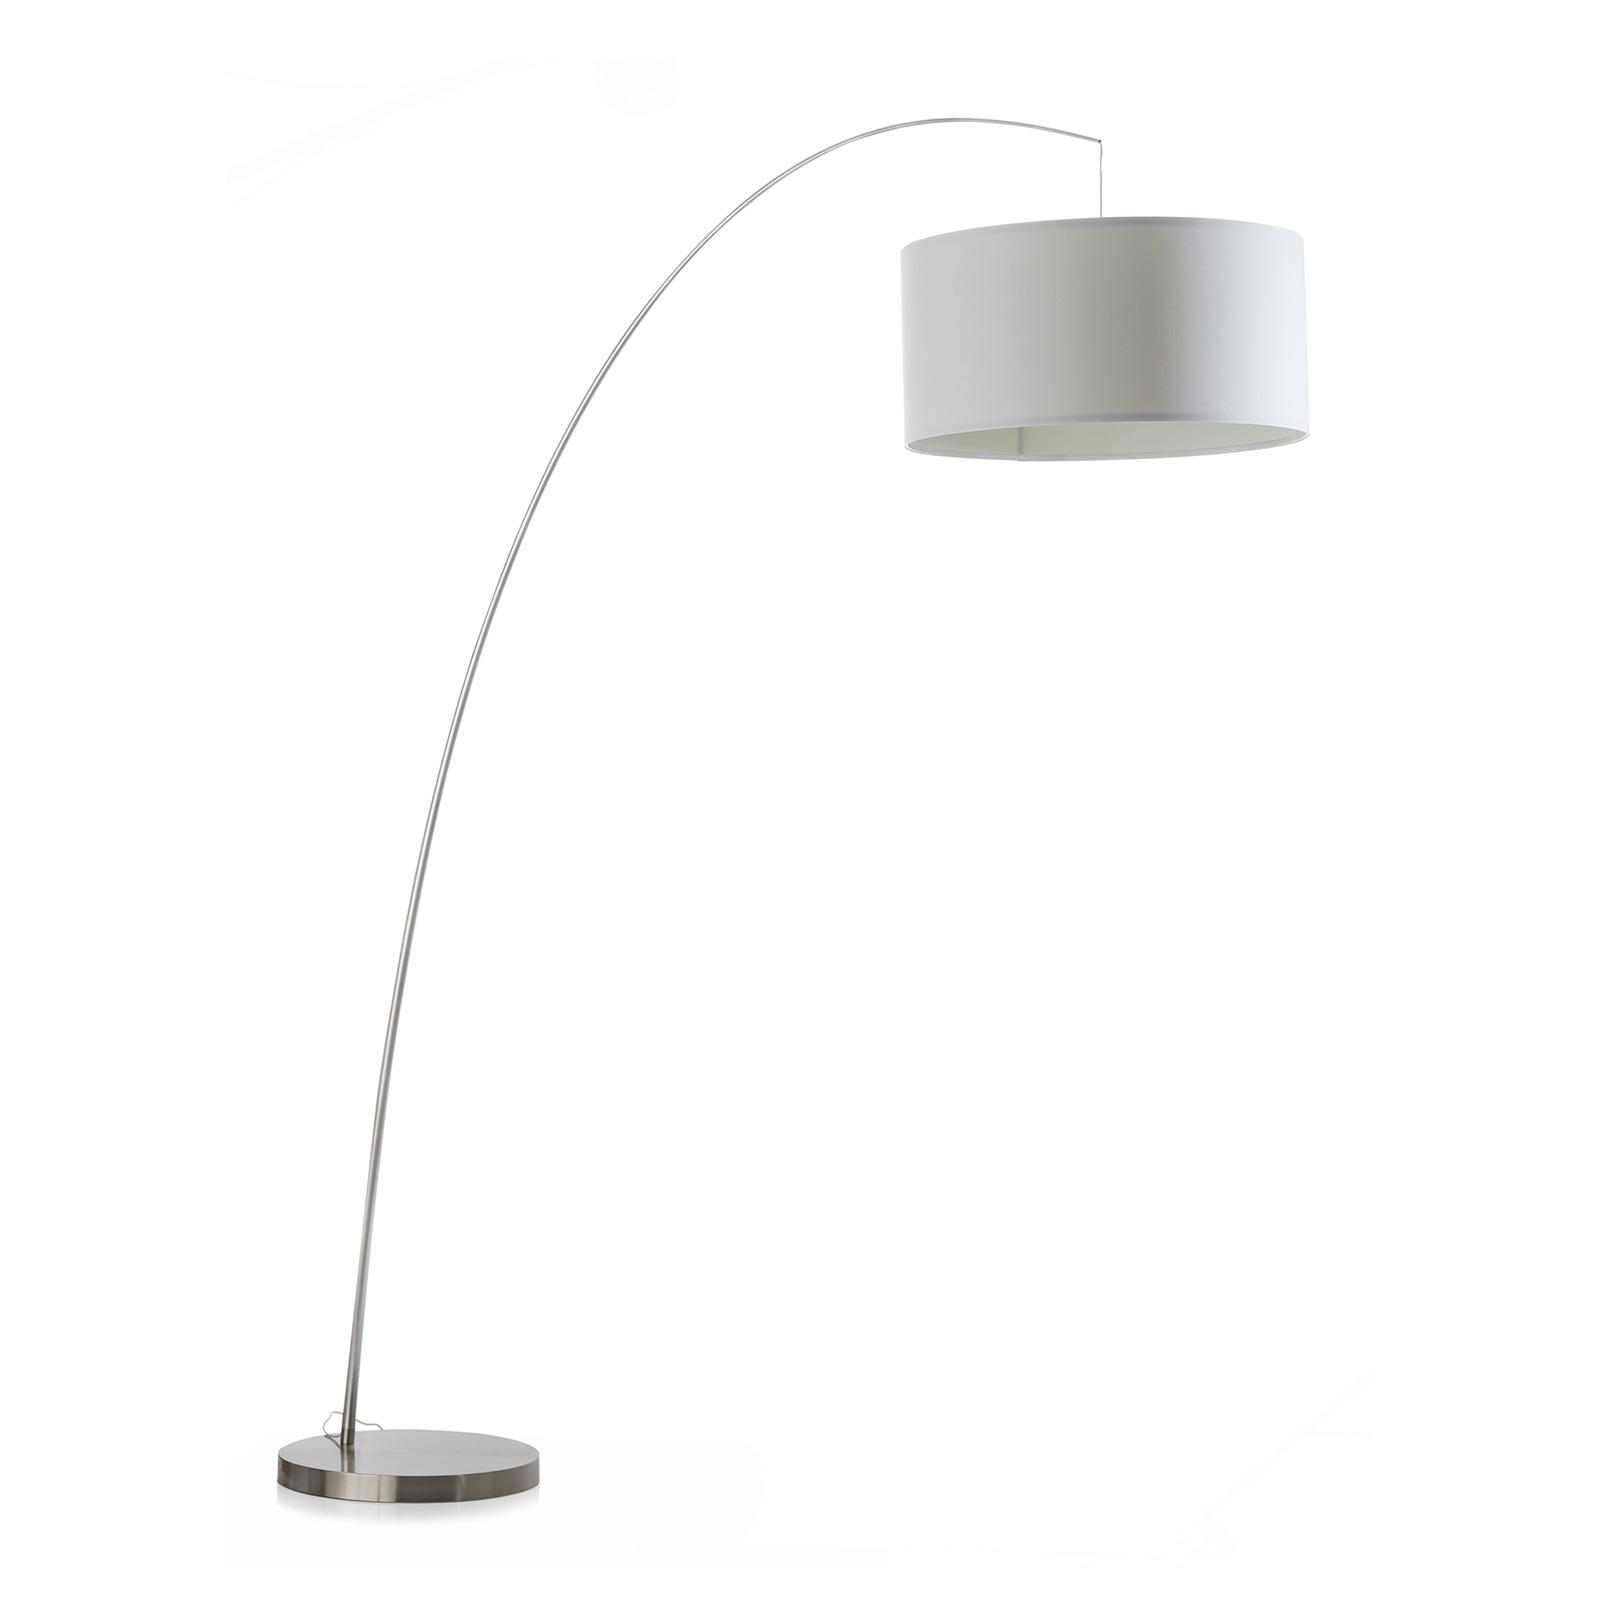 Boog-vloerlamp Fisher, wit/aluminium